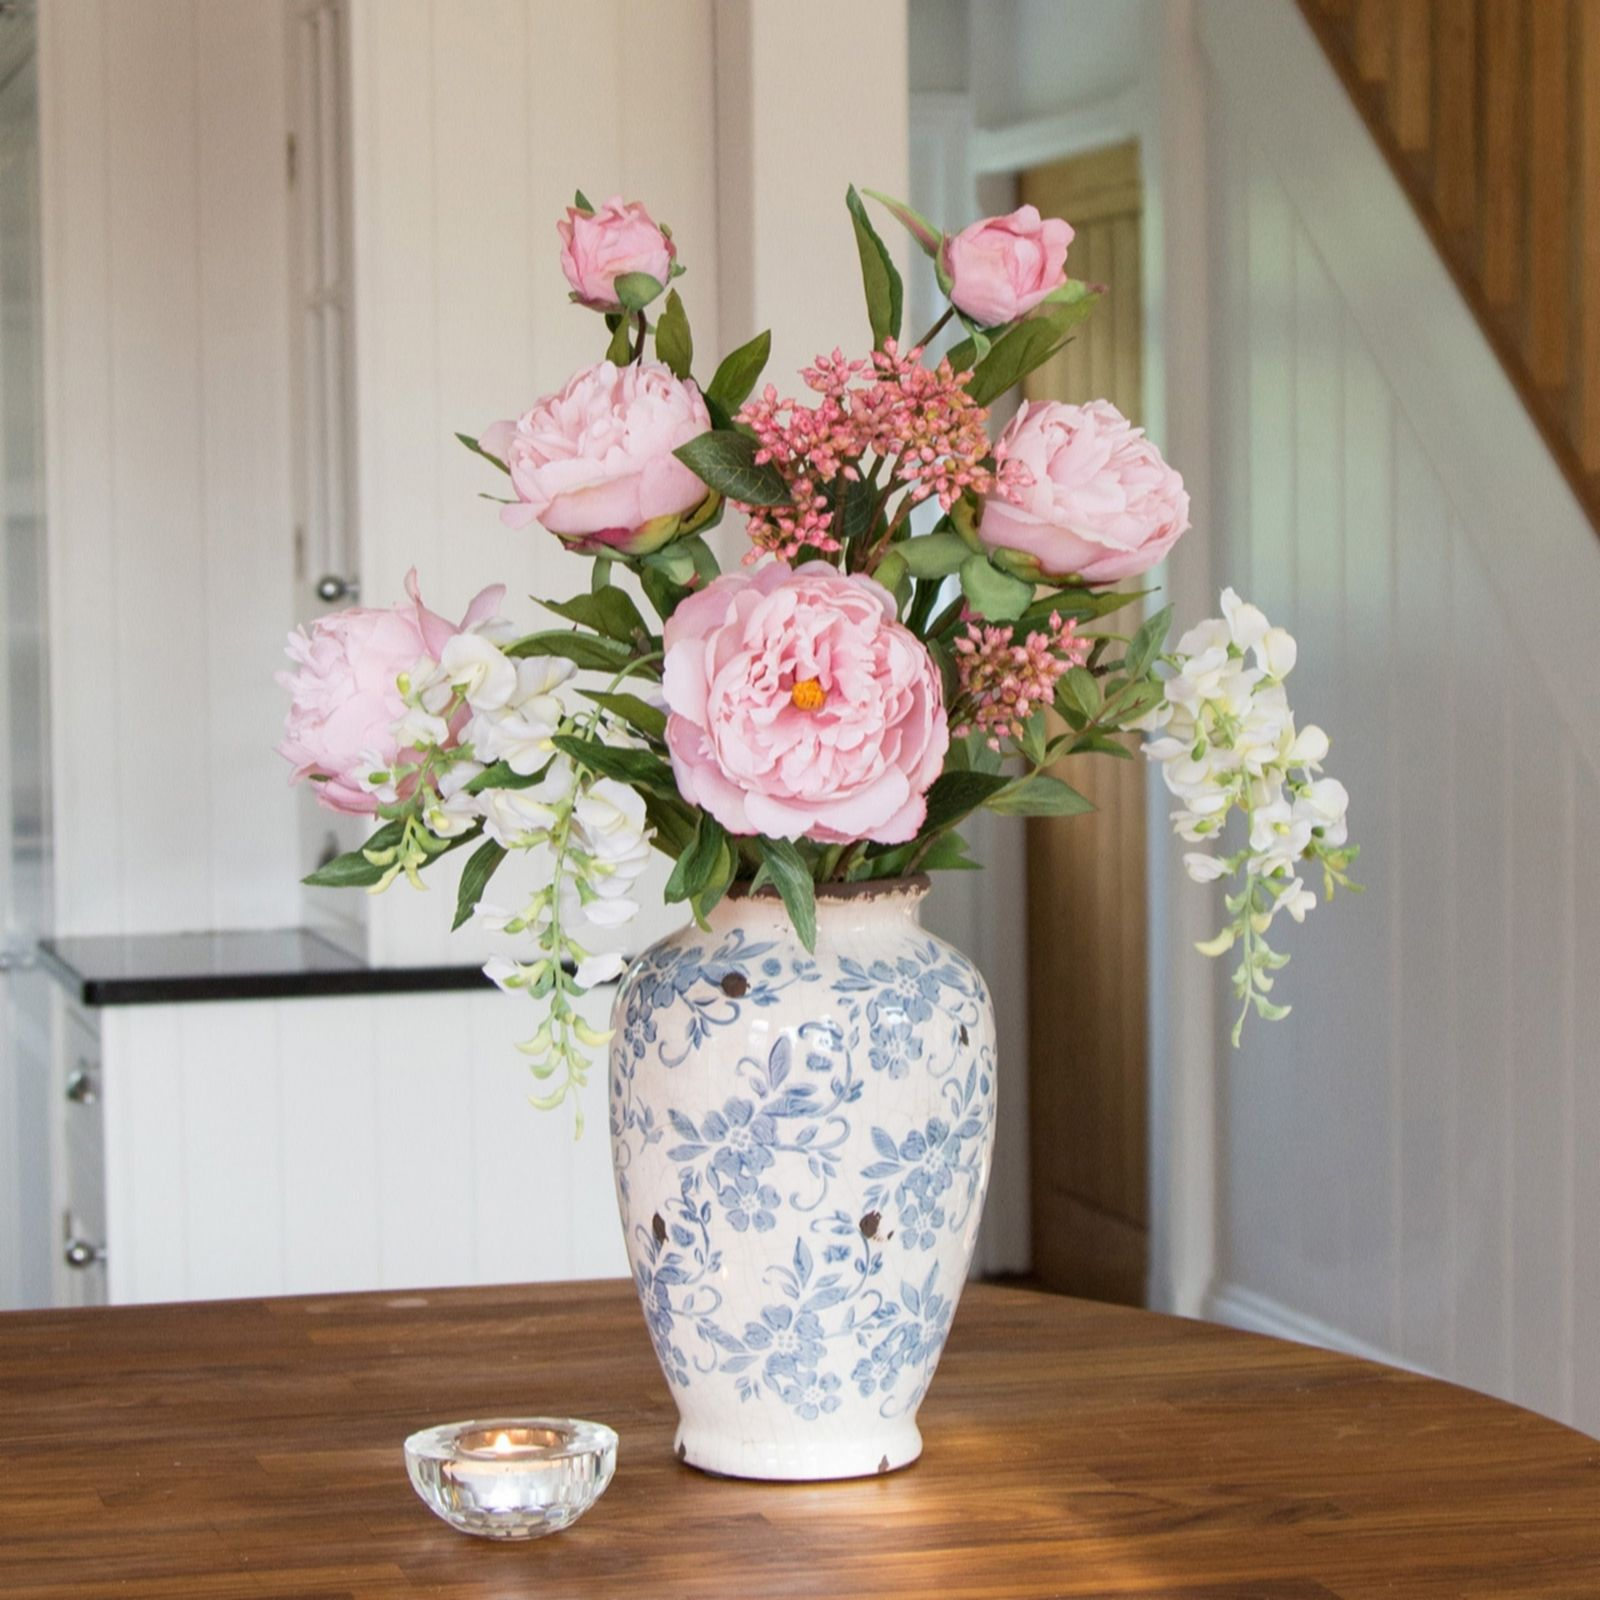 peony peonies in a vintage ceramic vase 706661 - Home Decor Uk